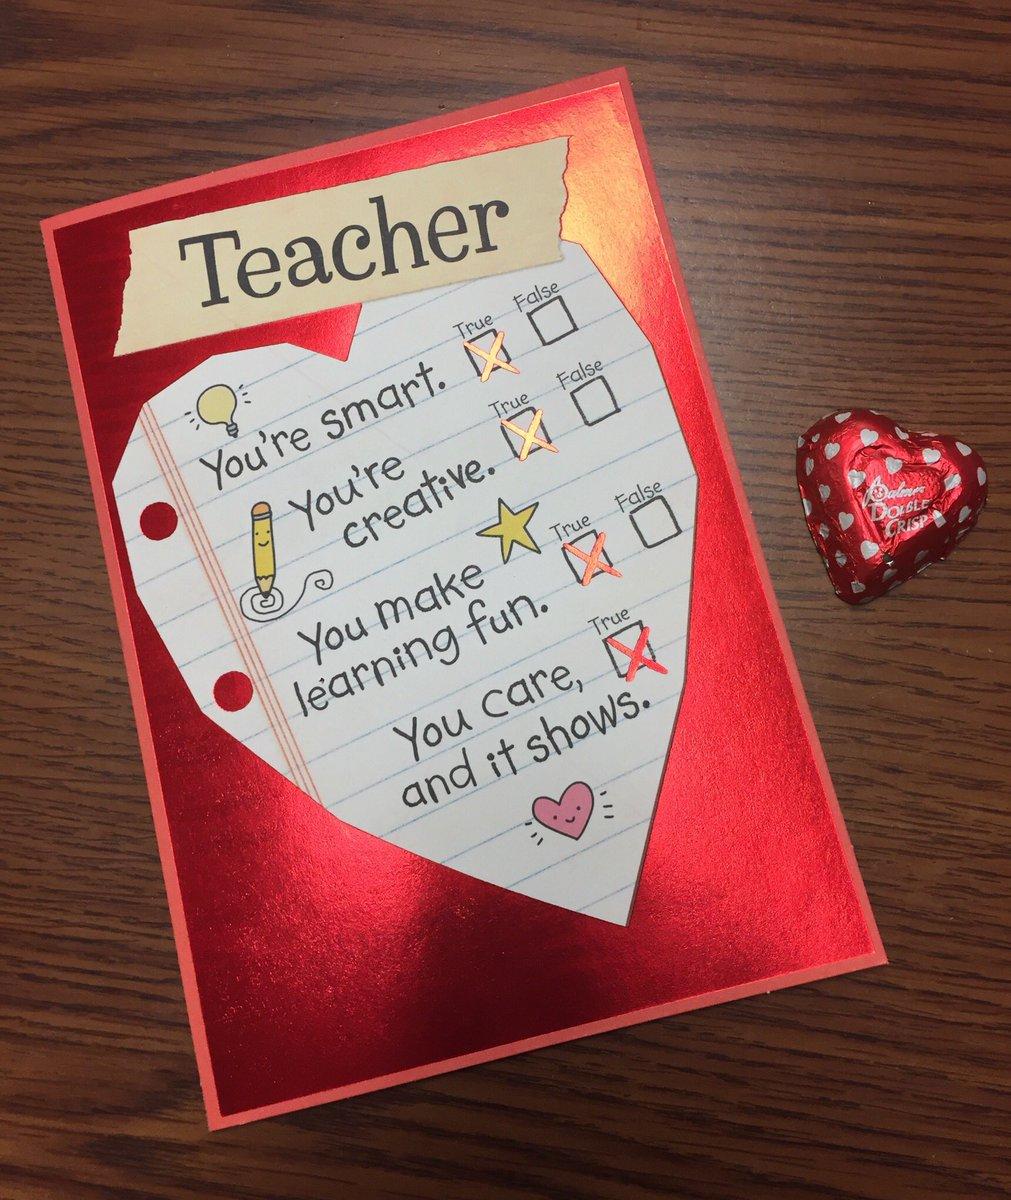 I ❤️ my students!